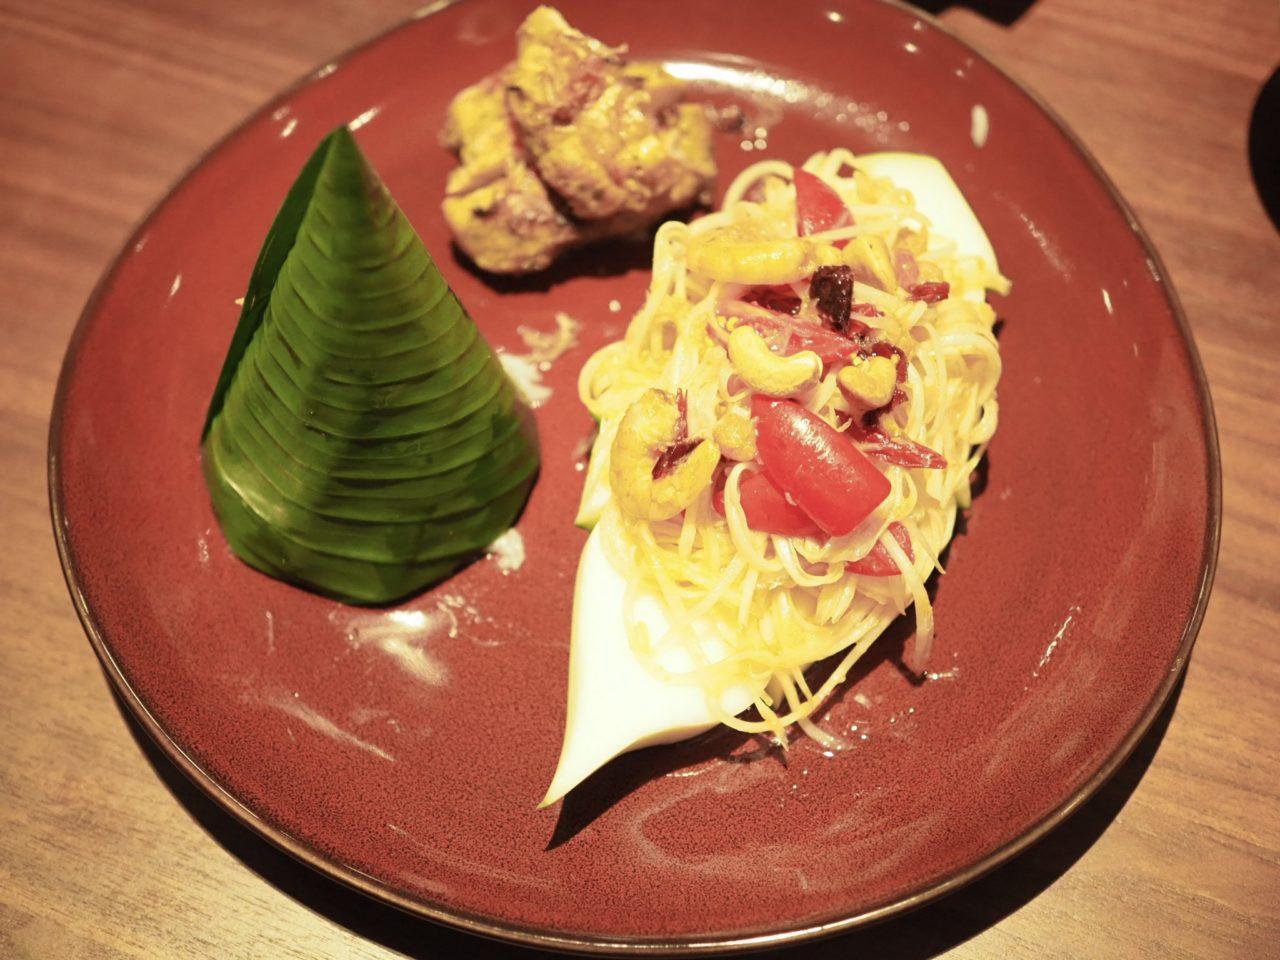 img 2934 - URBAN Cafe - スコータイ上海で味わう本場タイの味!期間限定メニューのご紹介